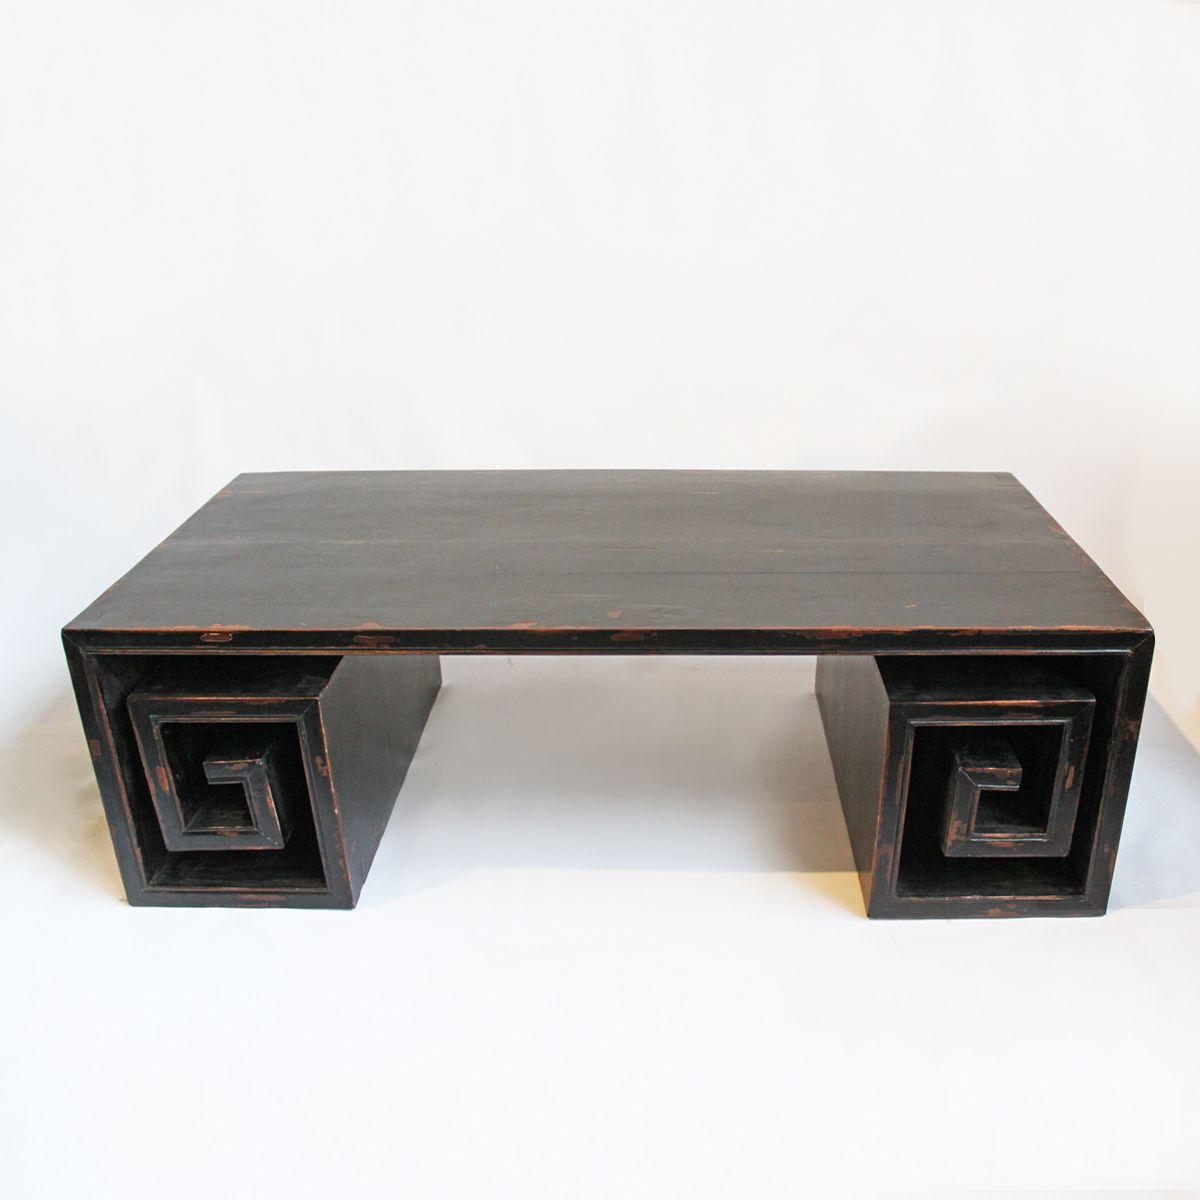 Vintage Black Distressed Coffee Table With Greek Key Rolled Leg